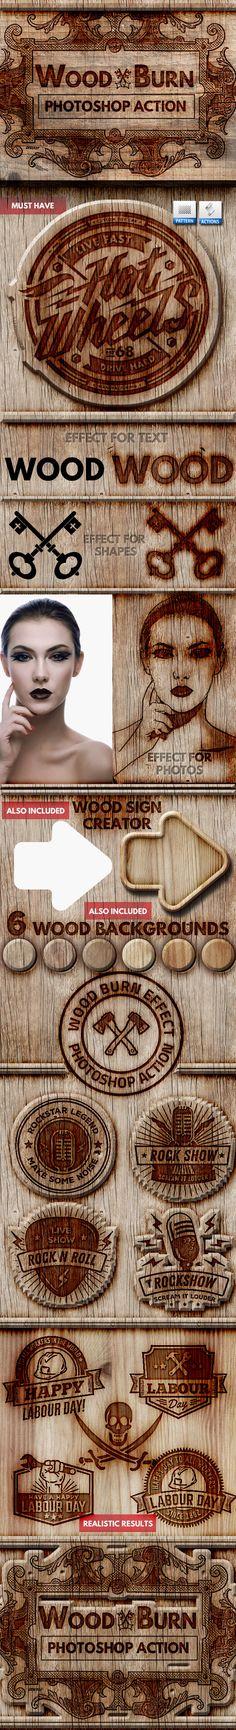 Wood Burn Effect Photoshop Action